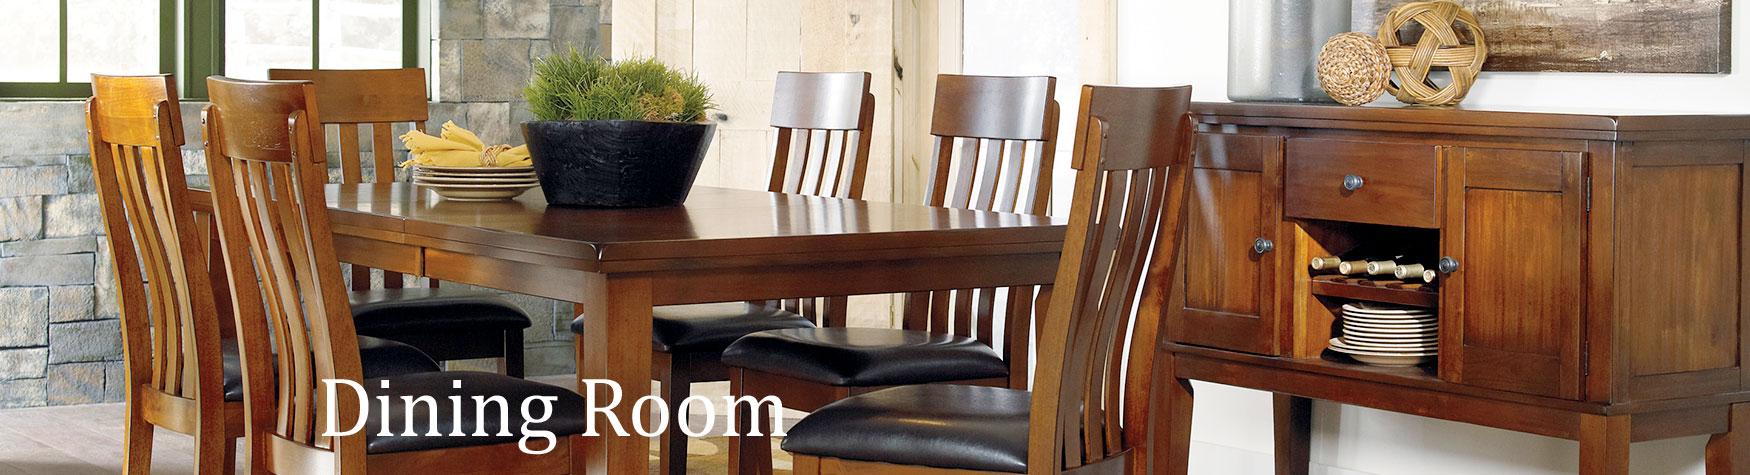 banner-dining-room.jpg